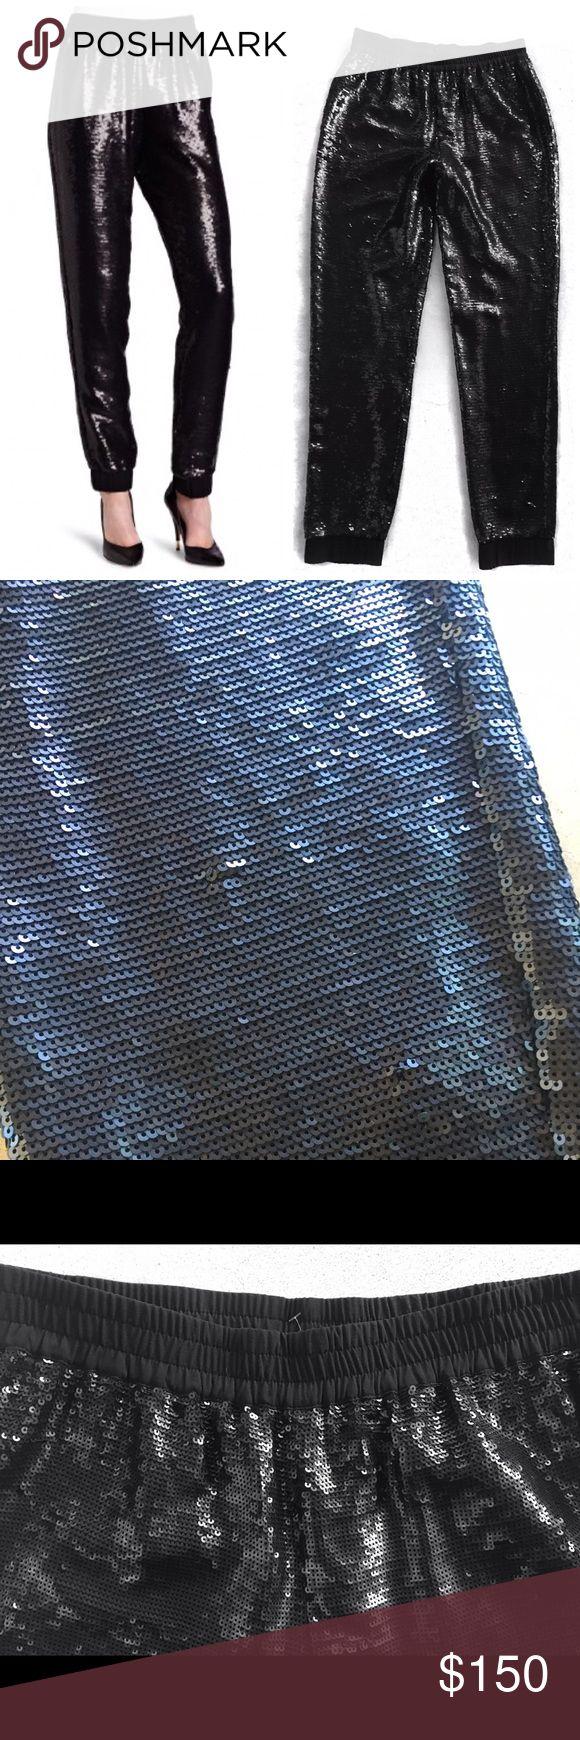 BCBC MAX AZRIA ZHARA BLACK SEQUINED PANTS SZ M BCBC MAX AZRIA  ZHARA BLACK SEQUINED PANTS  SZ M RETAILS $398 BCBGMaxAzria Pants Skinny